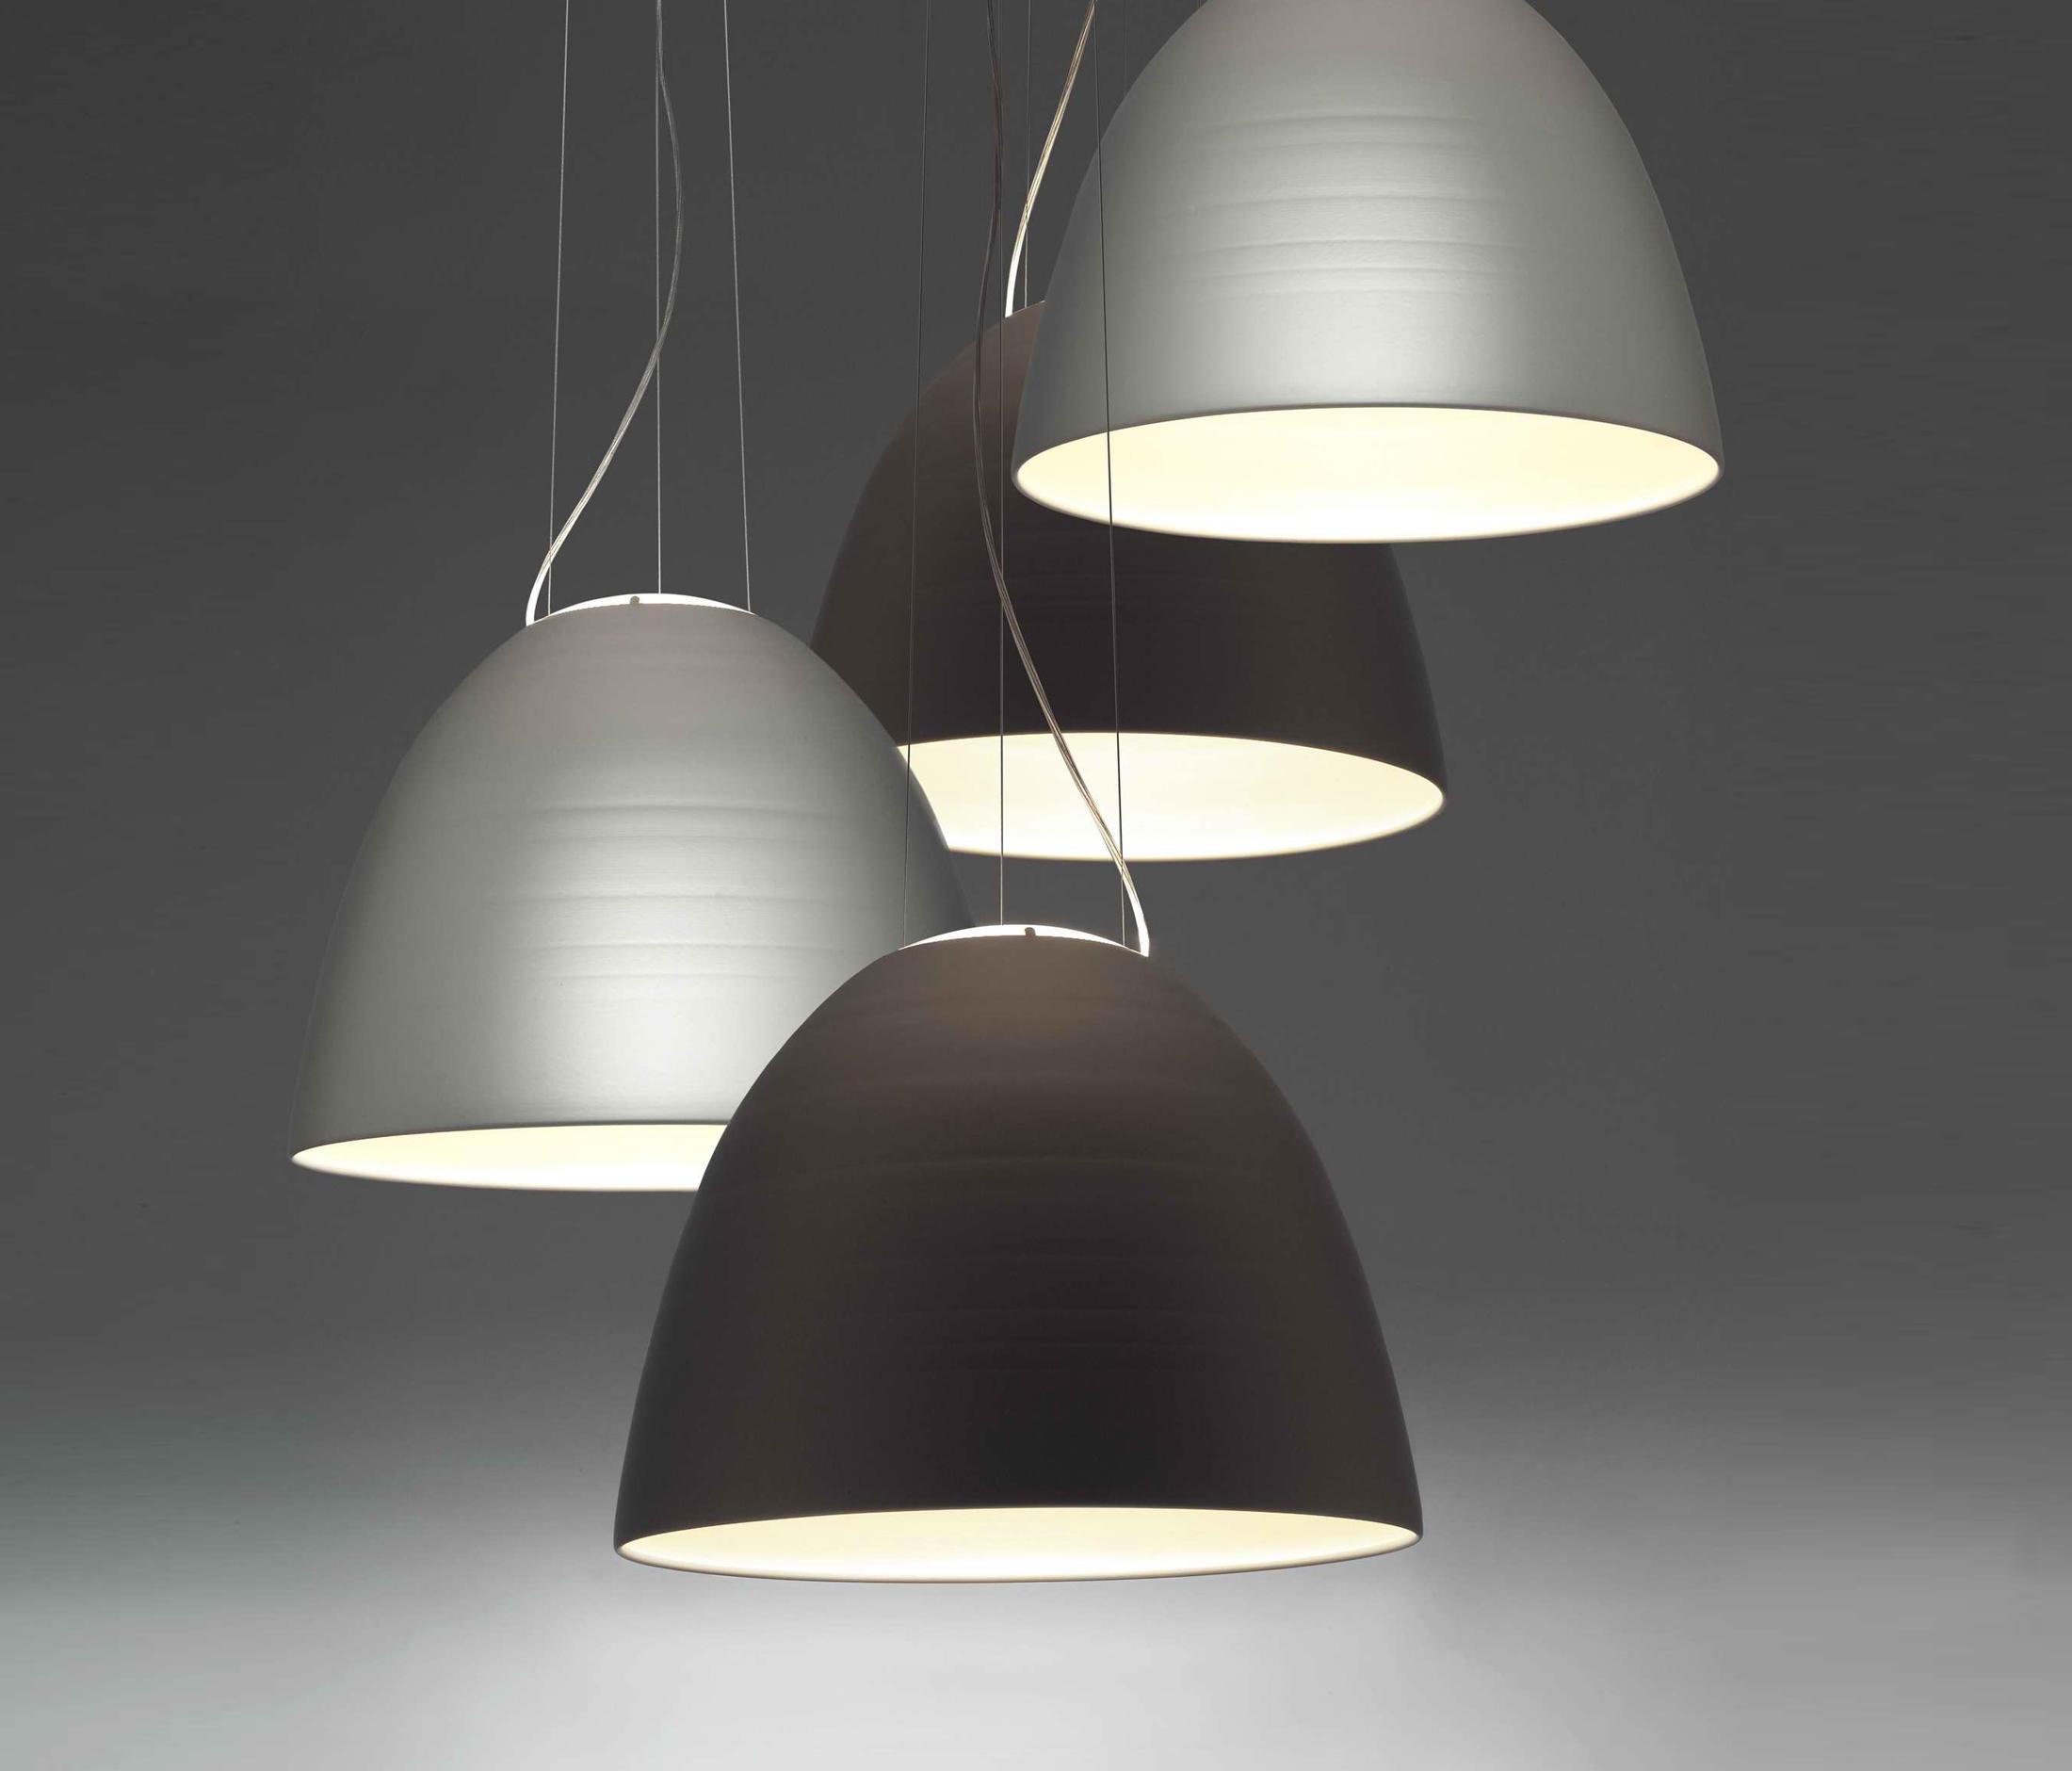 nur gloss luminaires suspension clairage g n ral de artemide architonic. Black Bedroom Furniture Sets. Home Design Ideas